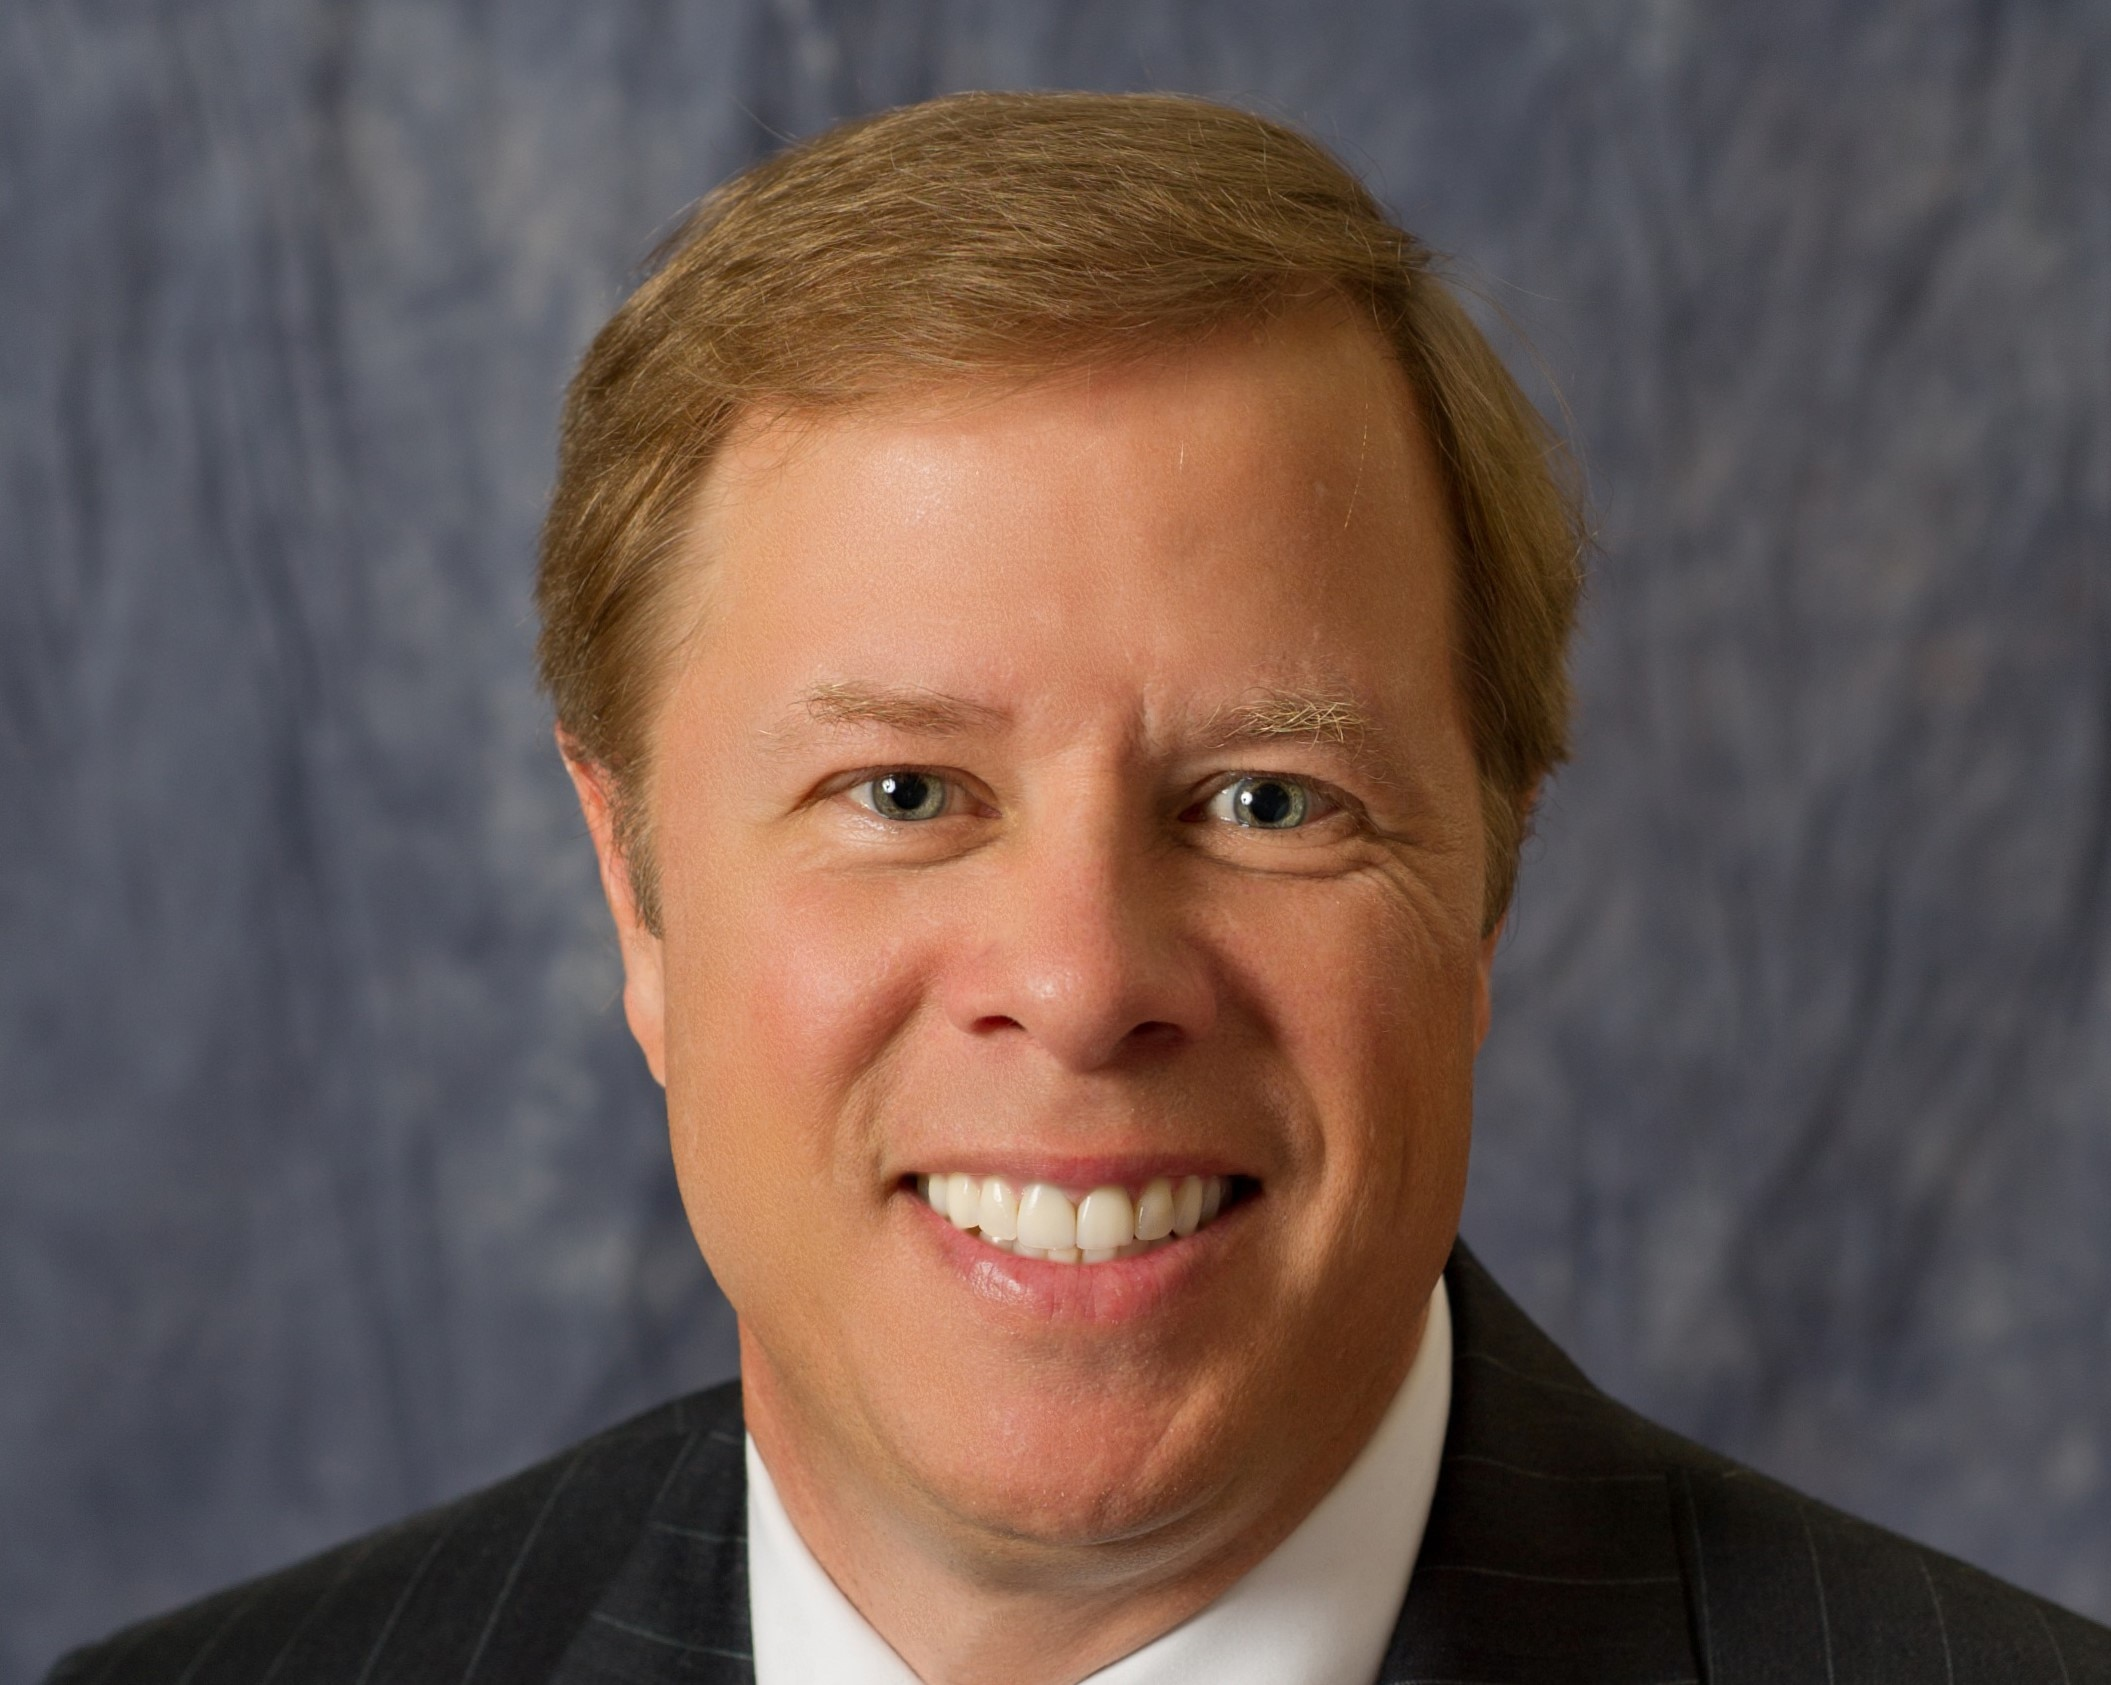 BRYAN D. WULZ  Your Financial Advisor